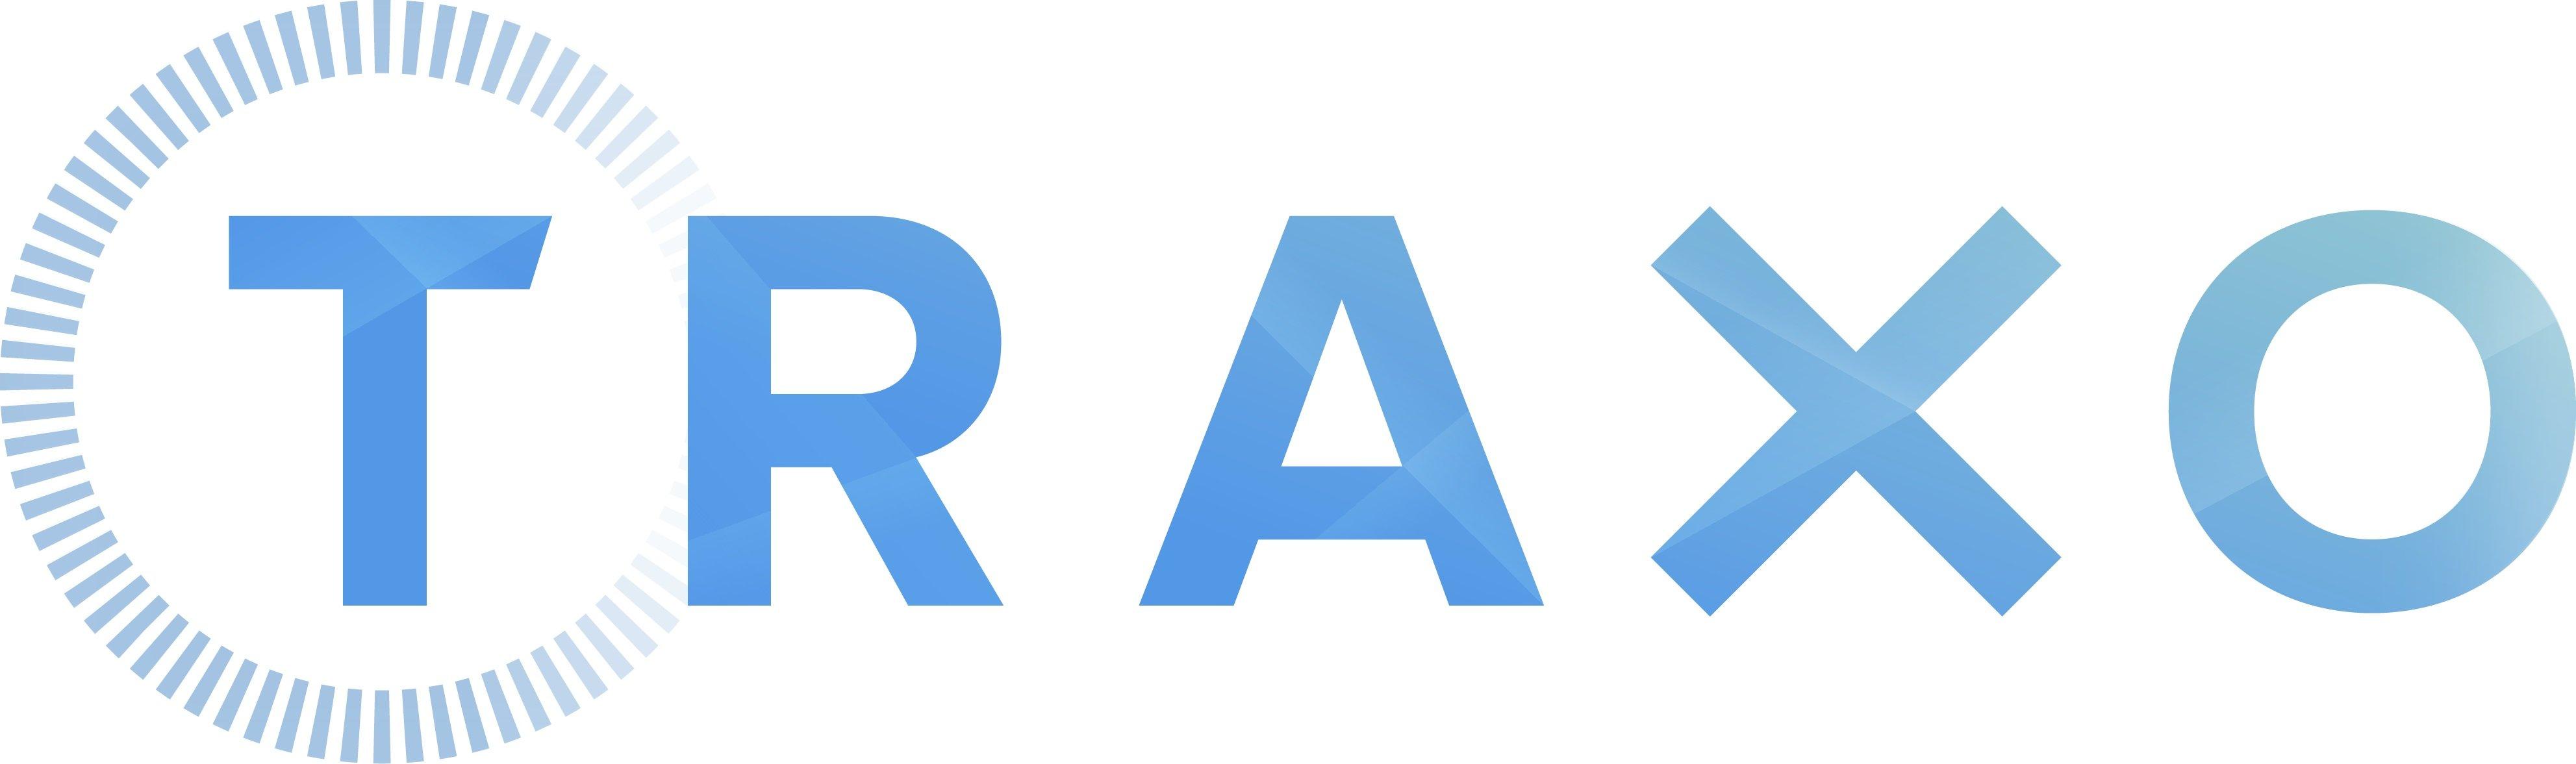 Traxo Logotype - Noon-Terra (2)-2